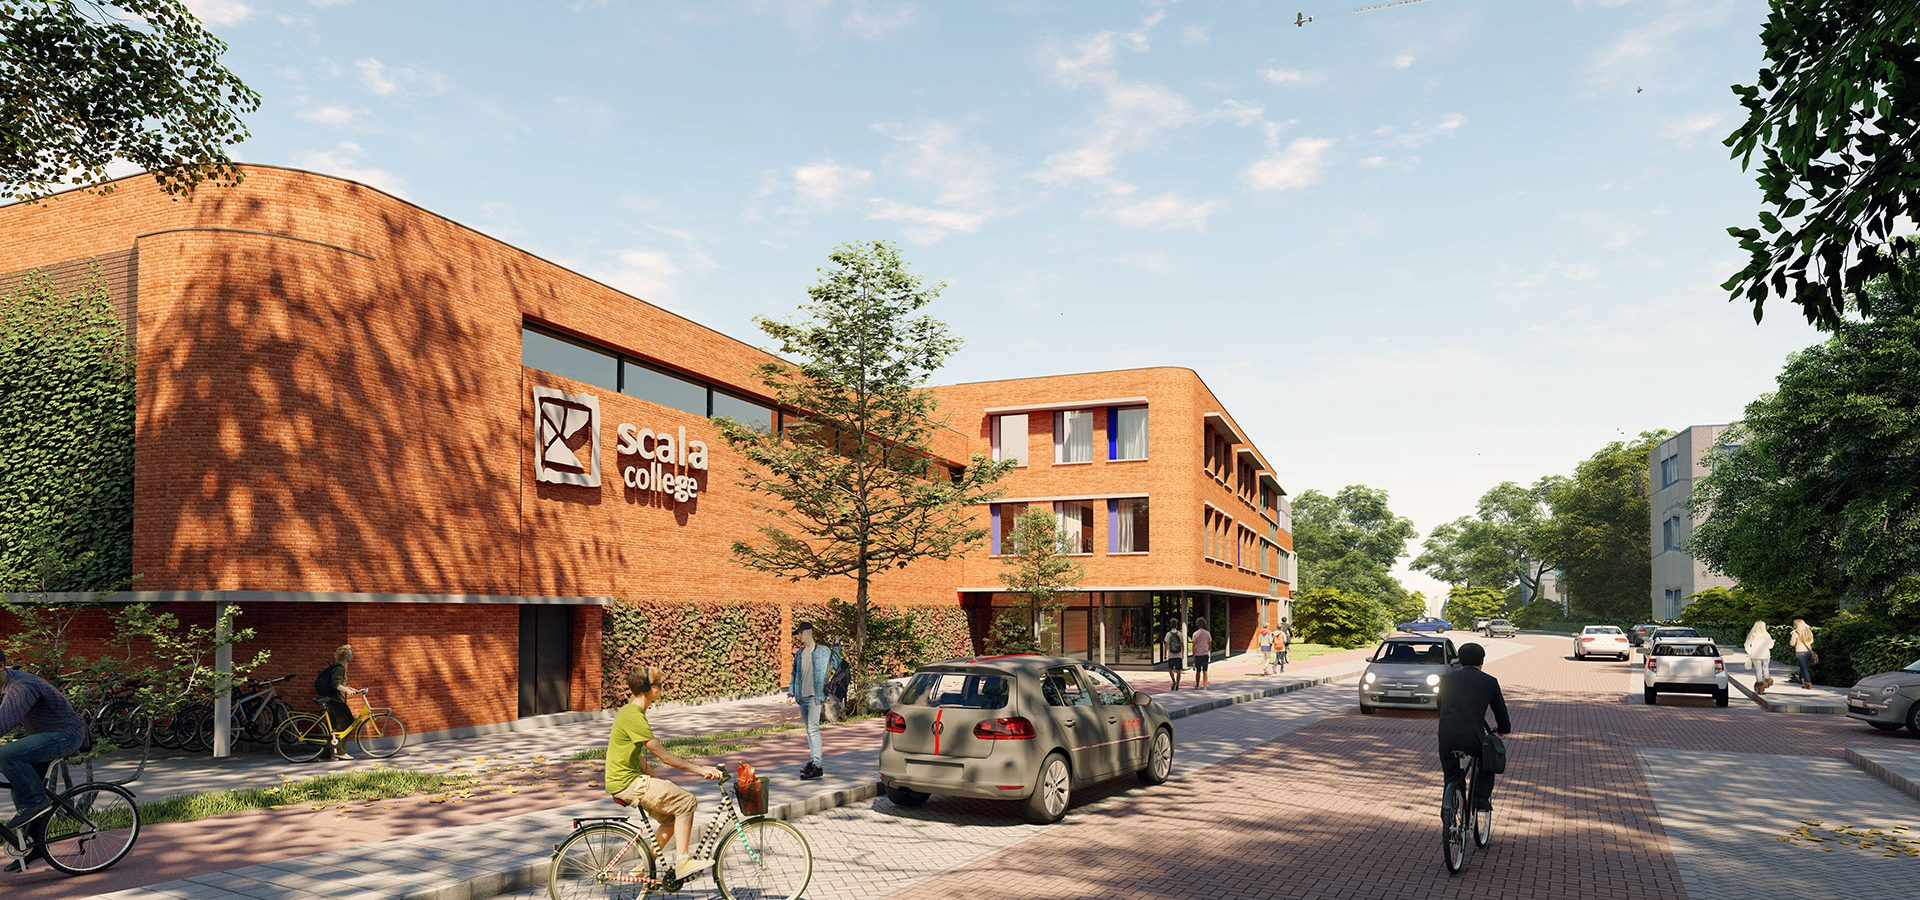 FARO architecten Scala Alphen aan den Rijn 02